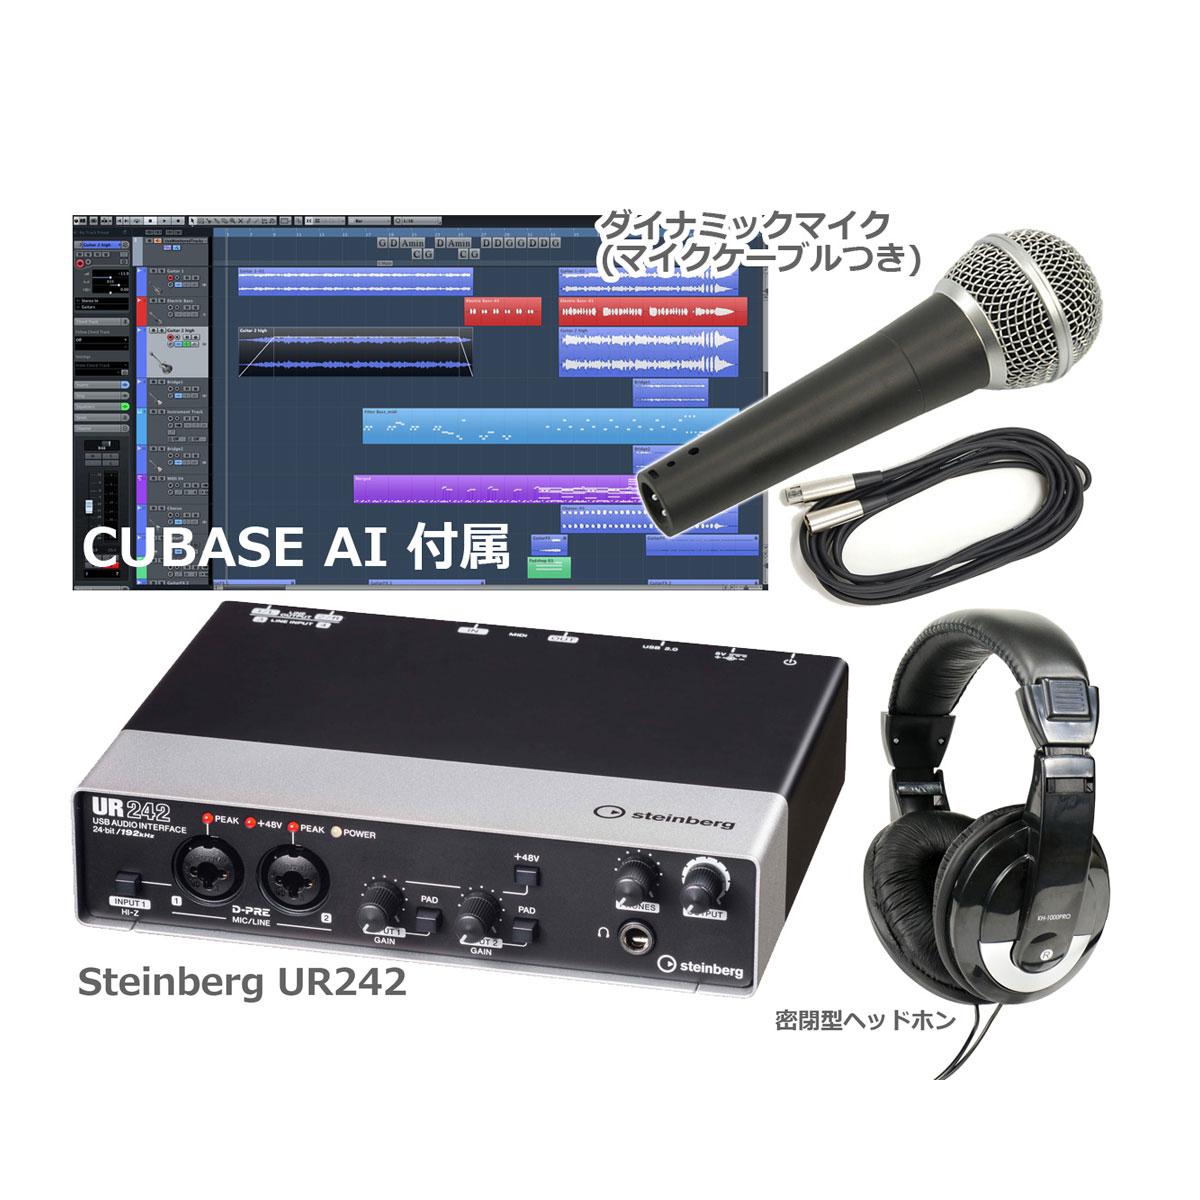 Steinberg スタインバーグ / UR242 オーディオインターフェース(UR-242) 【スタートセット!】